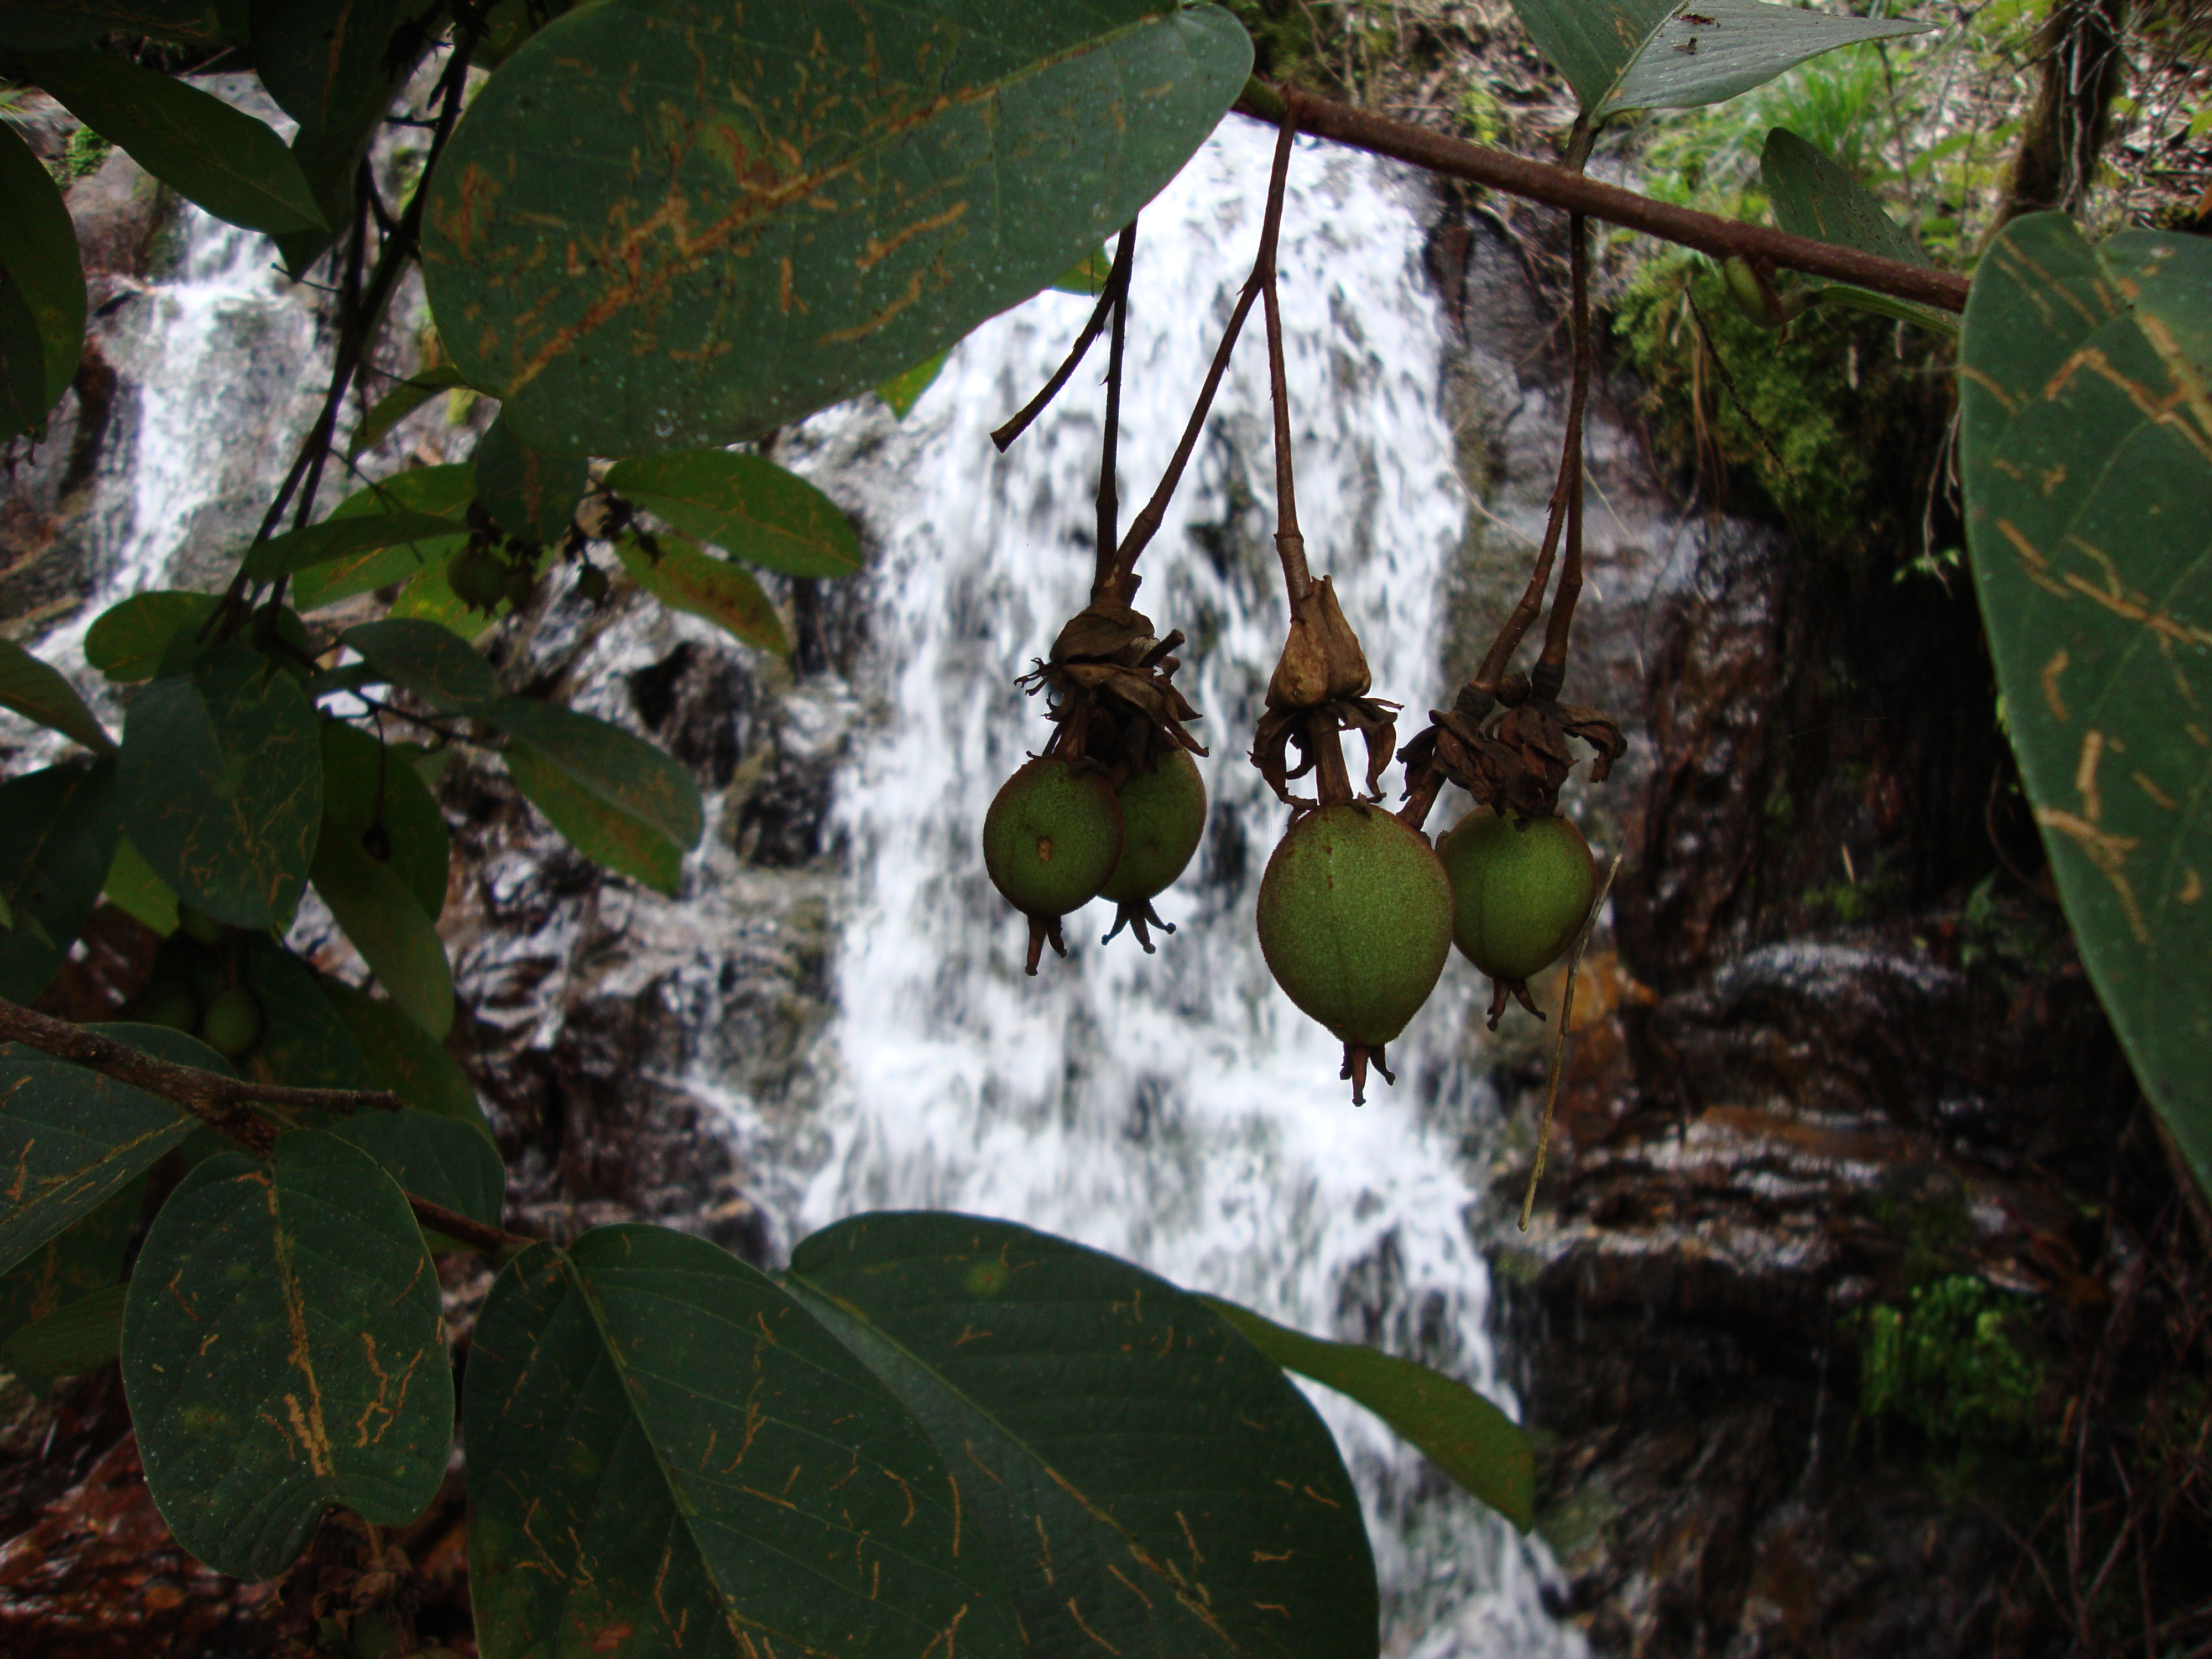 Vida y naturaleza Antioquia